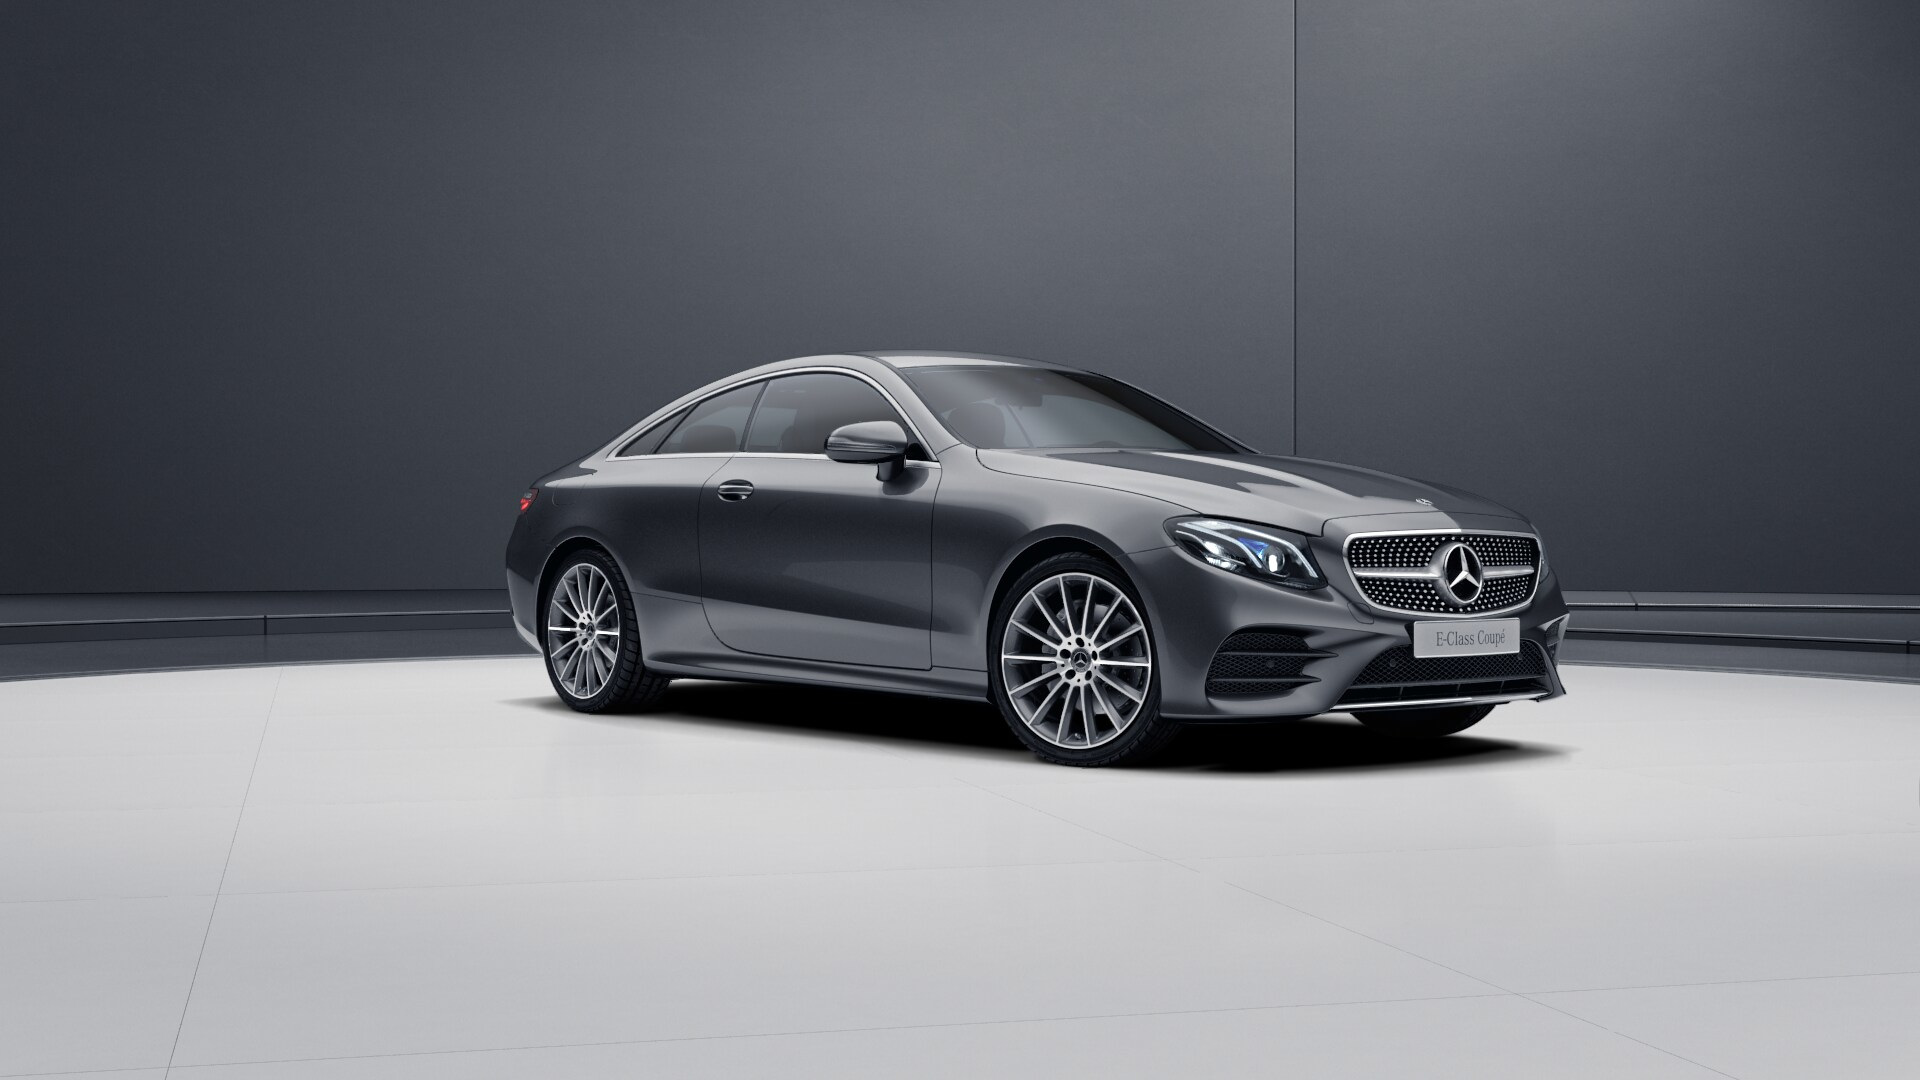 New 2017 mercedes benz e class e550 coupe in whitby for Mercedes benz e550 coupe